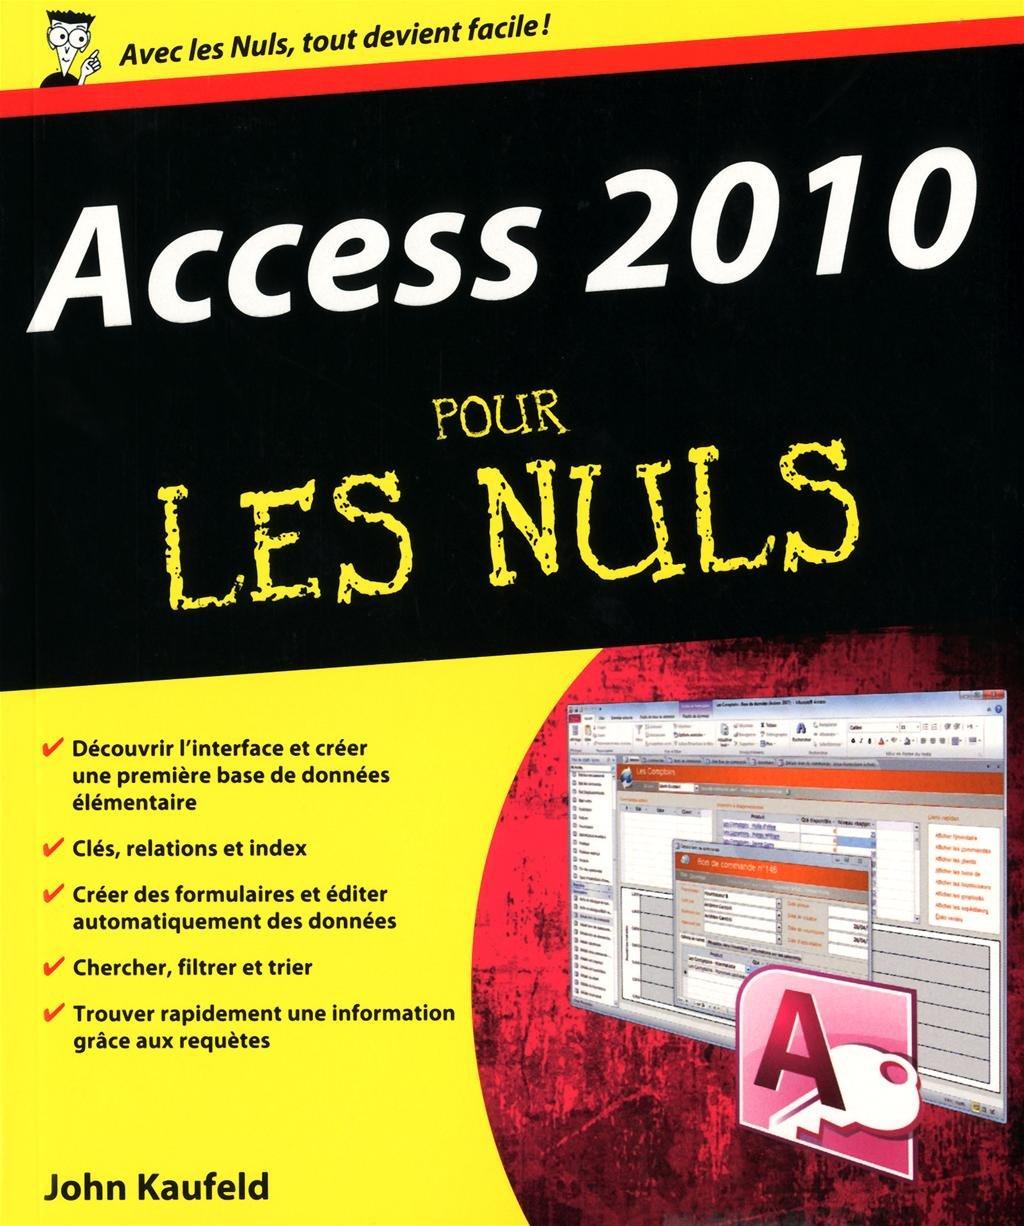 ACCESS 2010 POUR LES NULS Broché – 26 août 2010 JOHN KAUFELD First Interactive 2754020276 TL2754020276